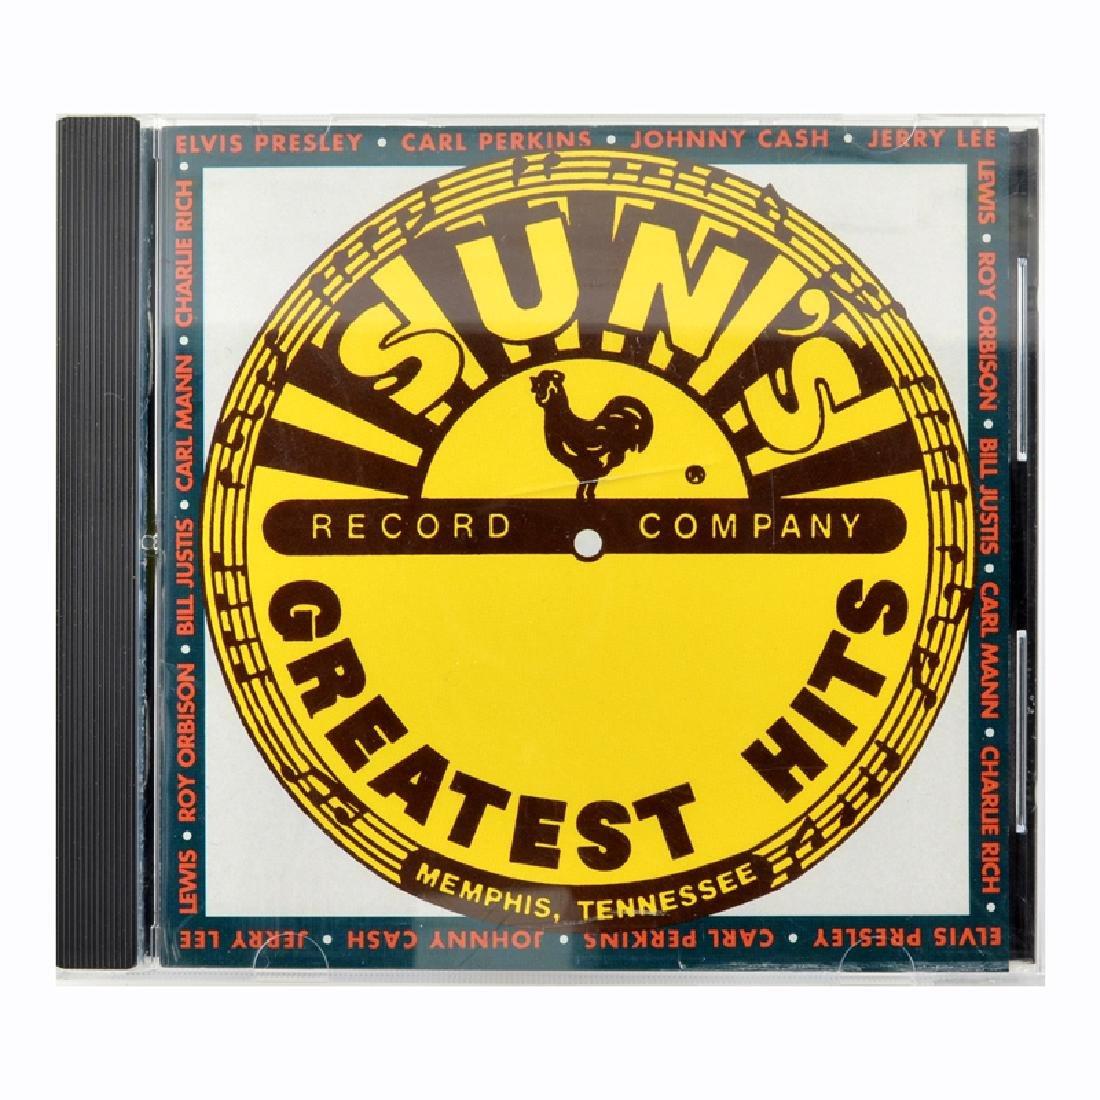 Sun's Album Company Greatest Hits CDs